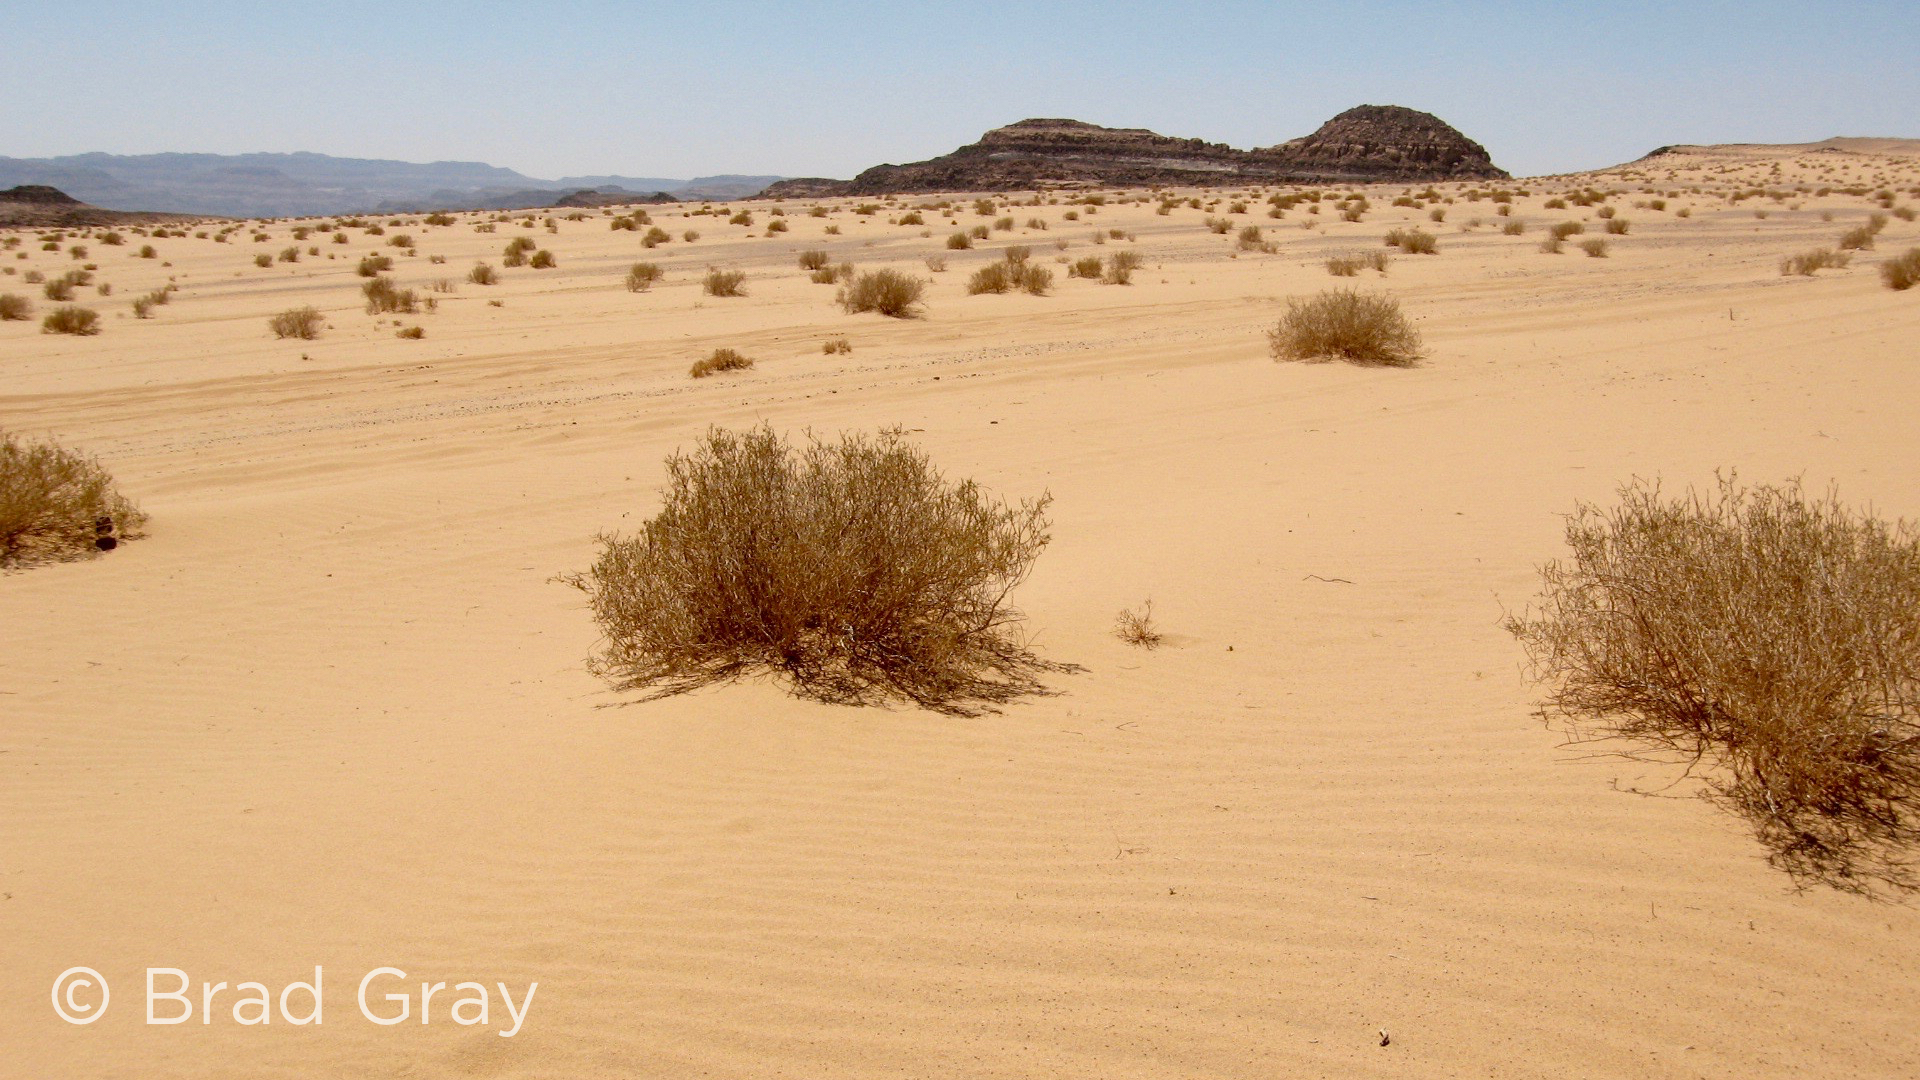 Sinai Desert - Brad Gray